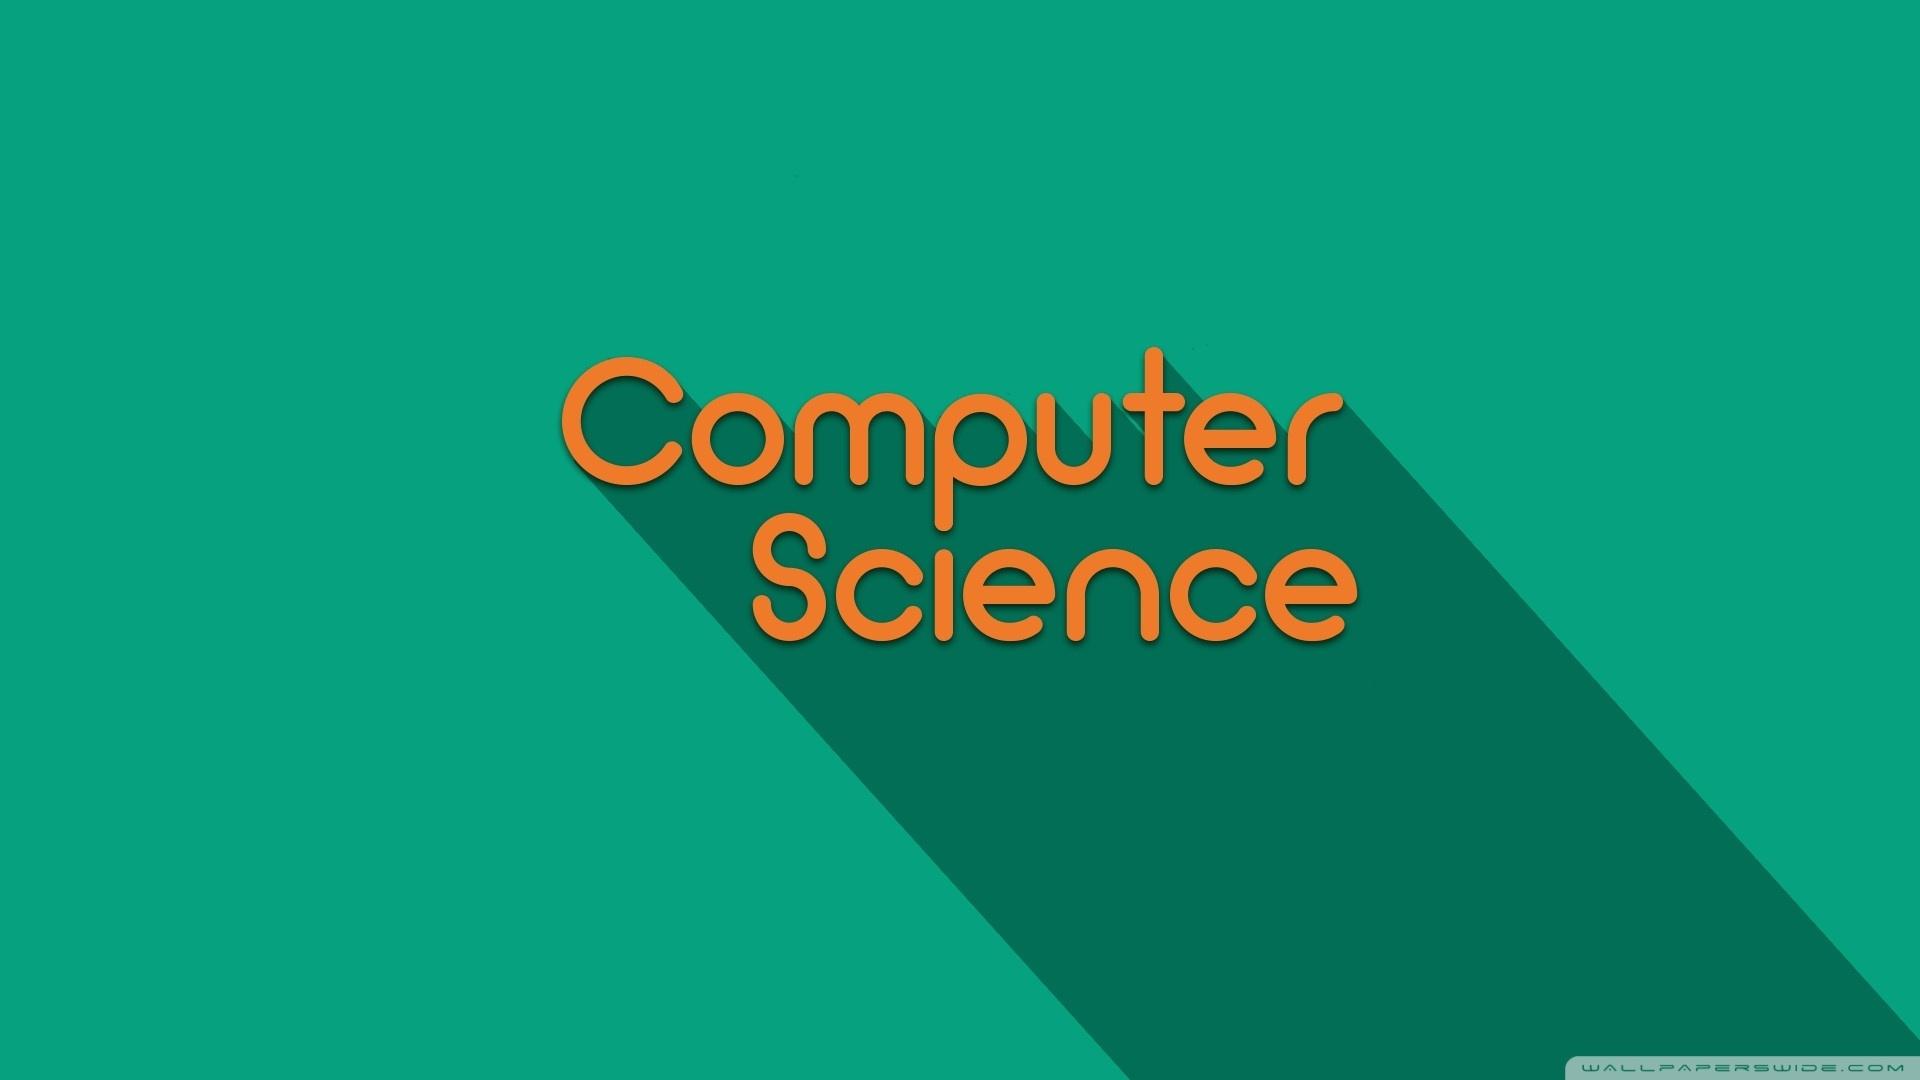 computer science ❤ 4k hd desktop wallpaper for 4k ultra hd tv